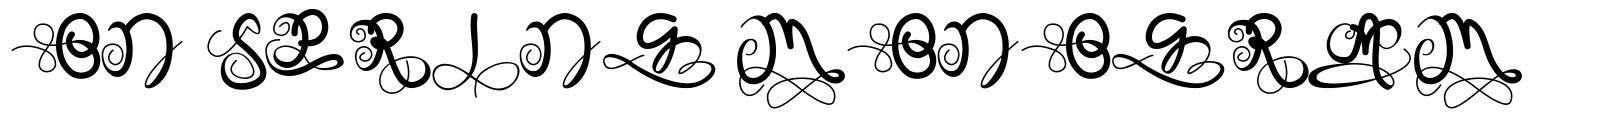 On Spring Monogram